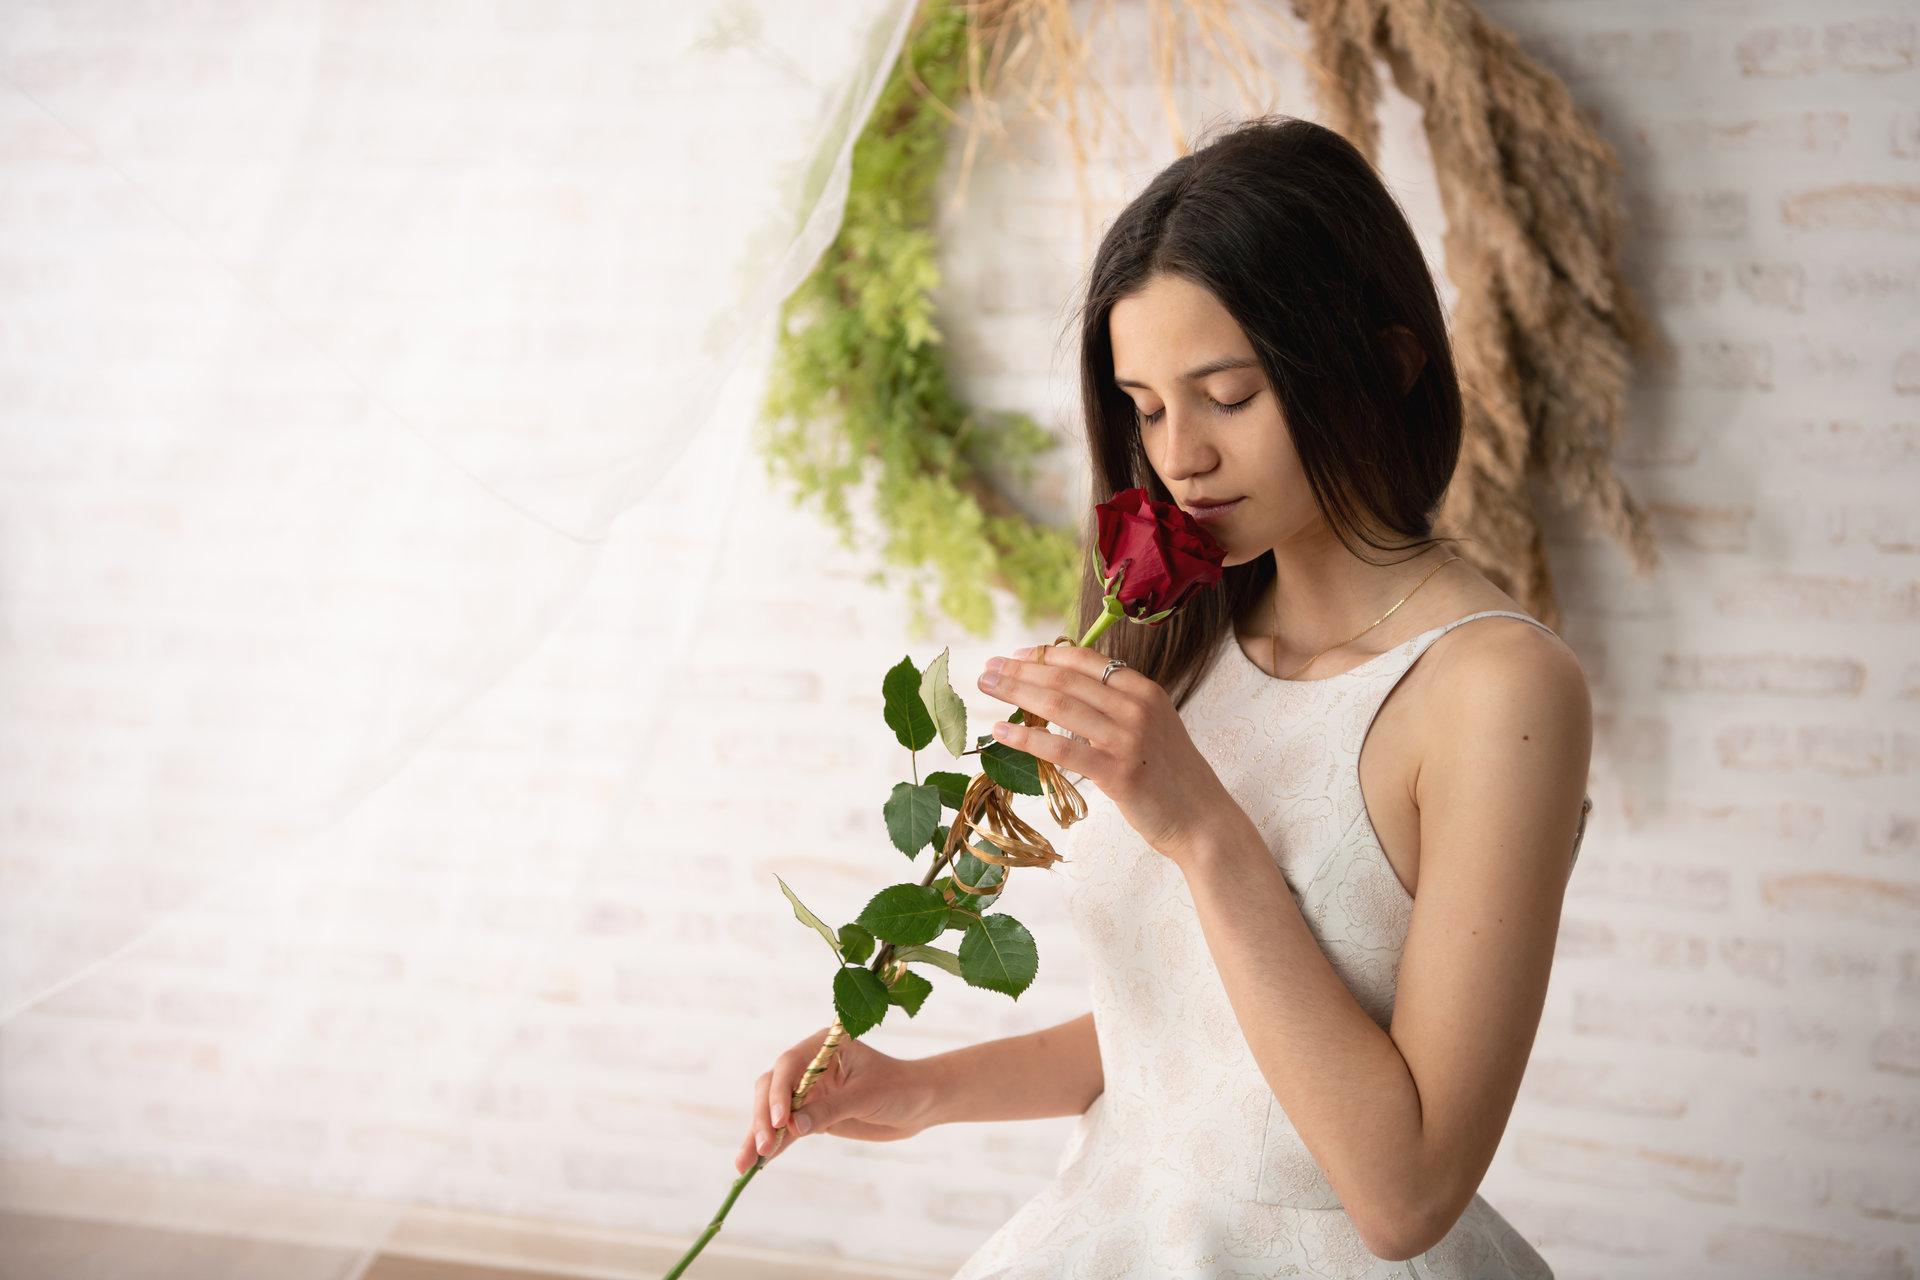 меланхолия | Author Даниела Илиева - dan75 | PHOTO FORUM